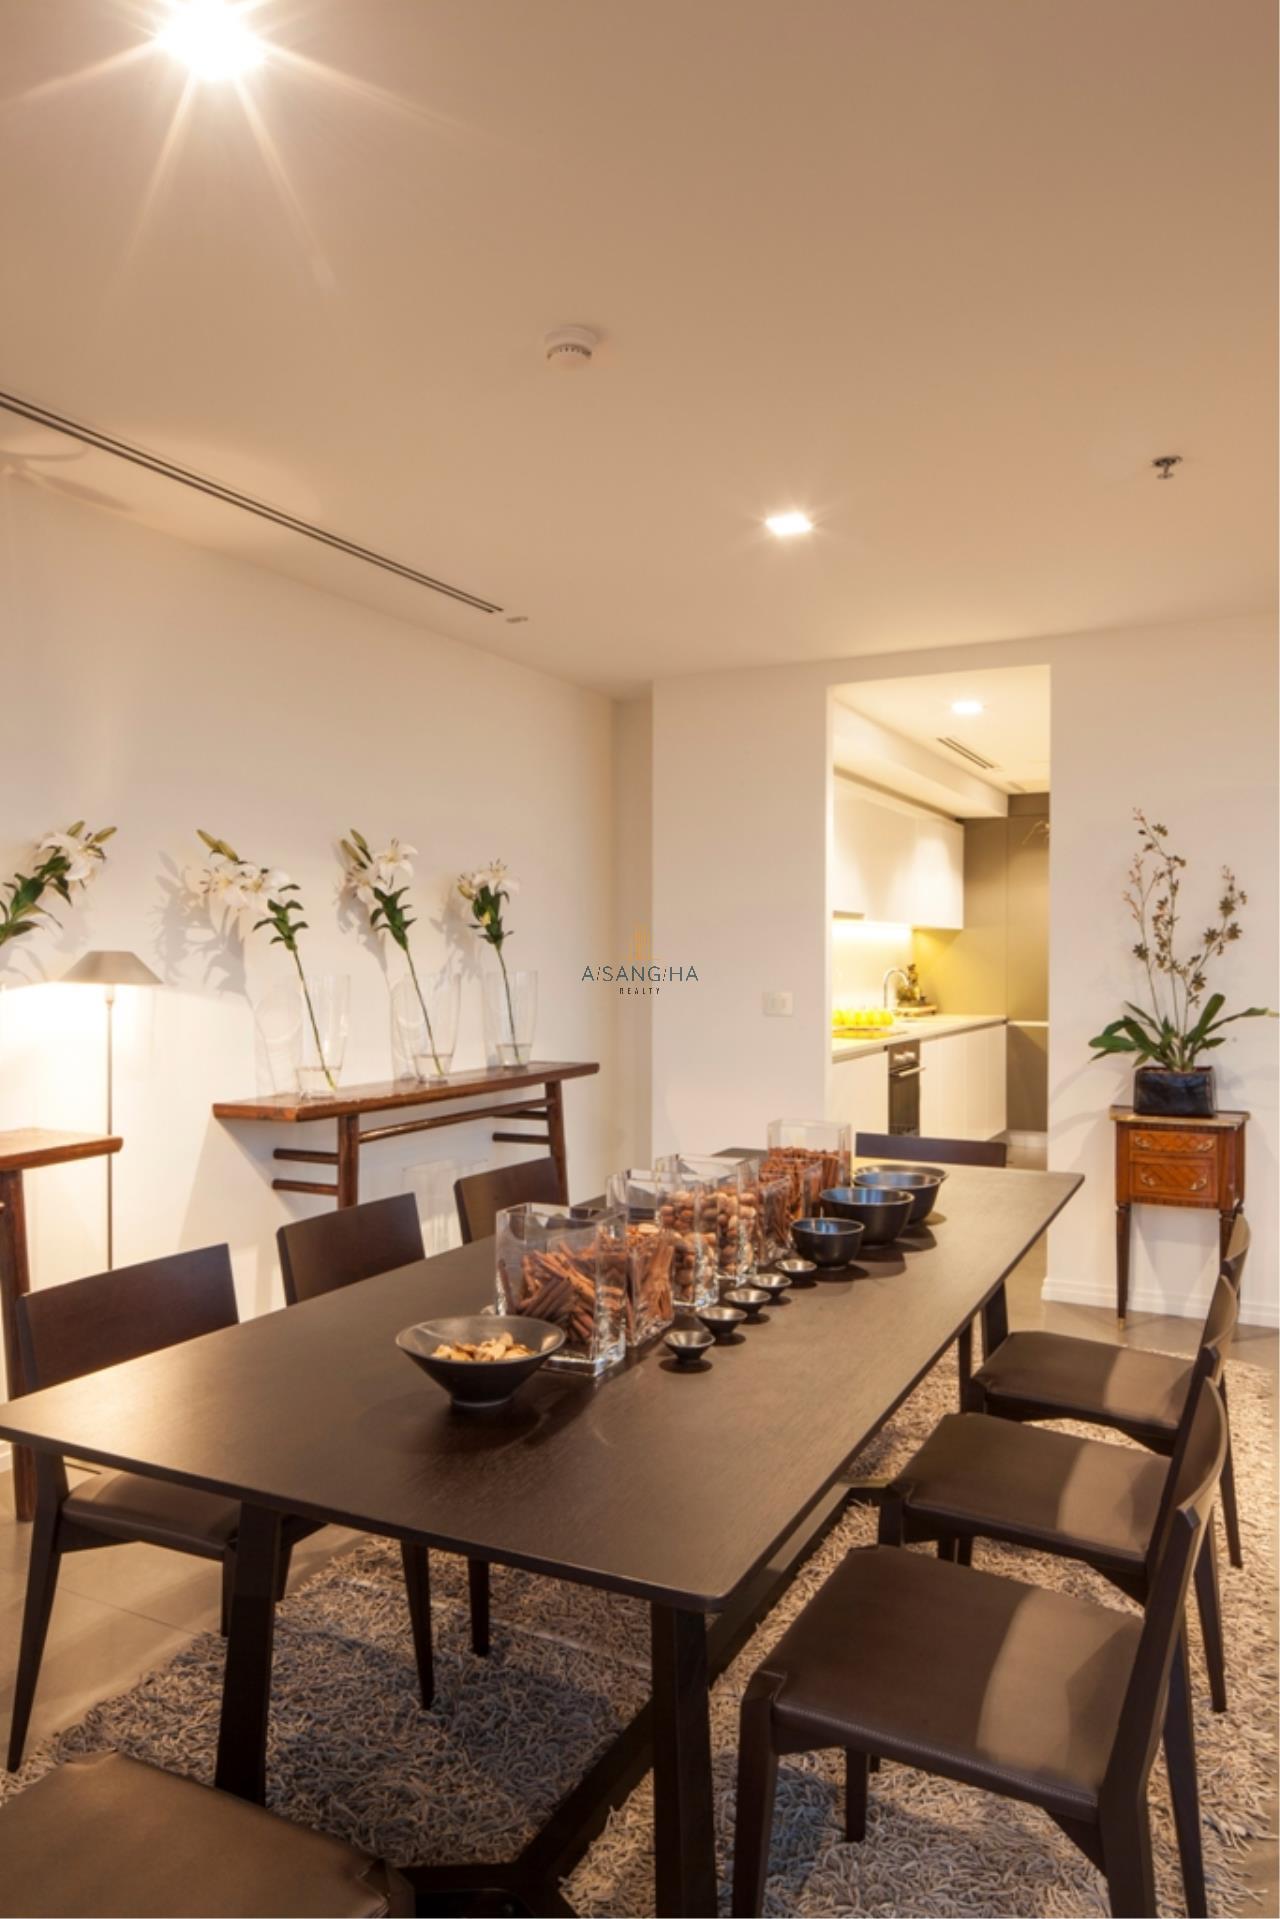 Asangha Realty Agency's 4 Bedrooms Duplex for Sale & Rent 8